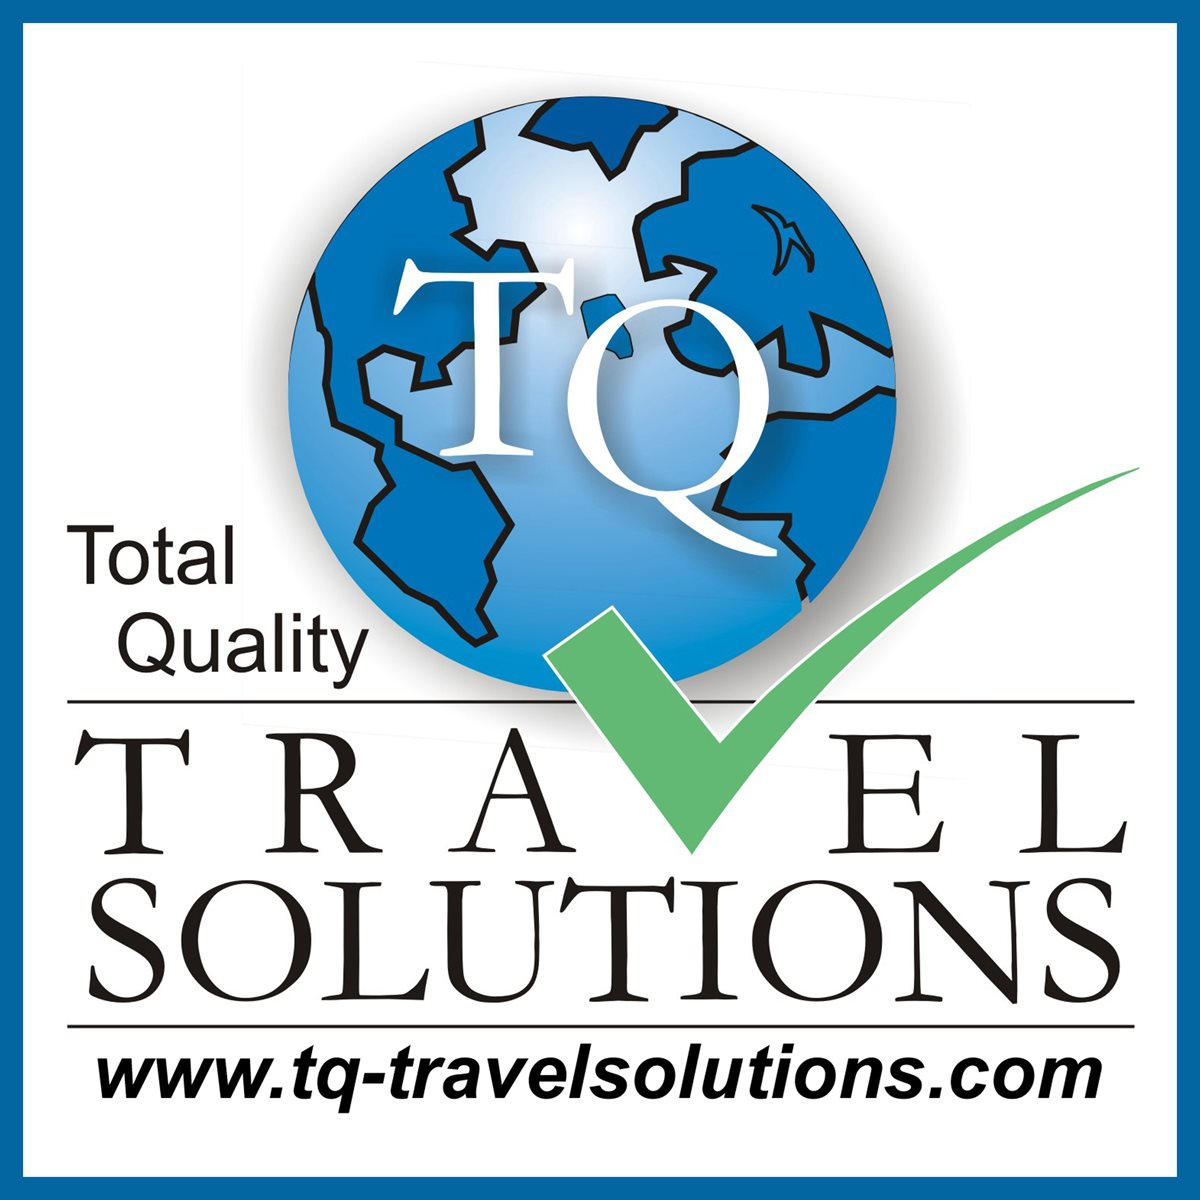 TQ TRAVEL SOLUTIONS